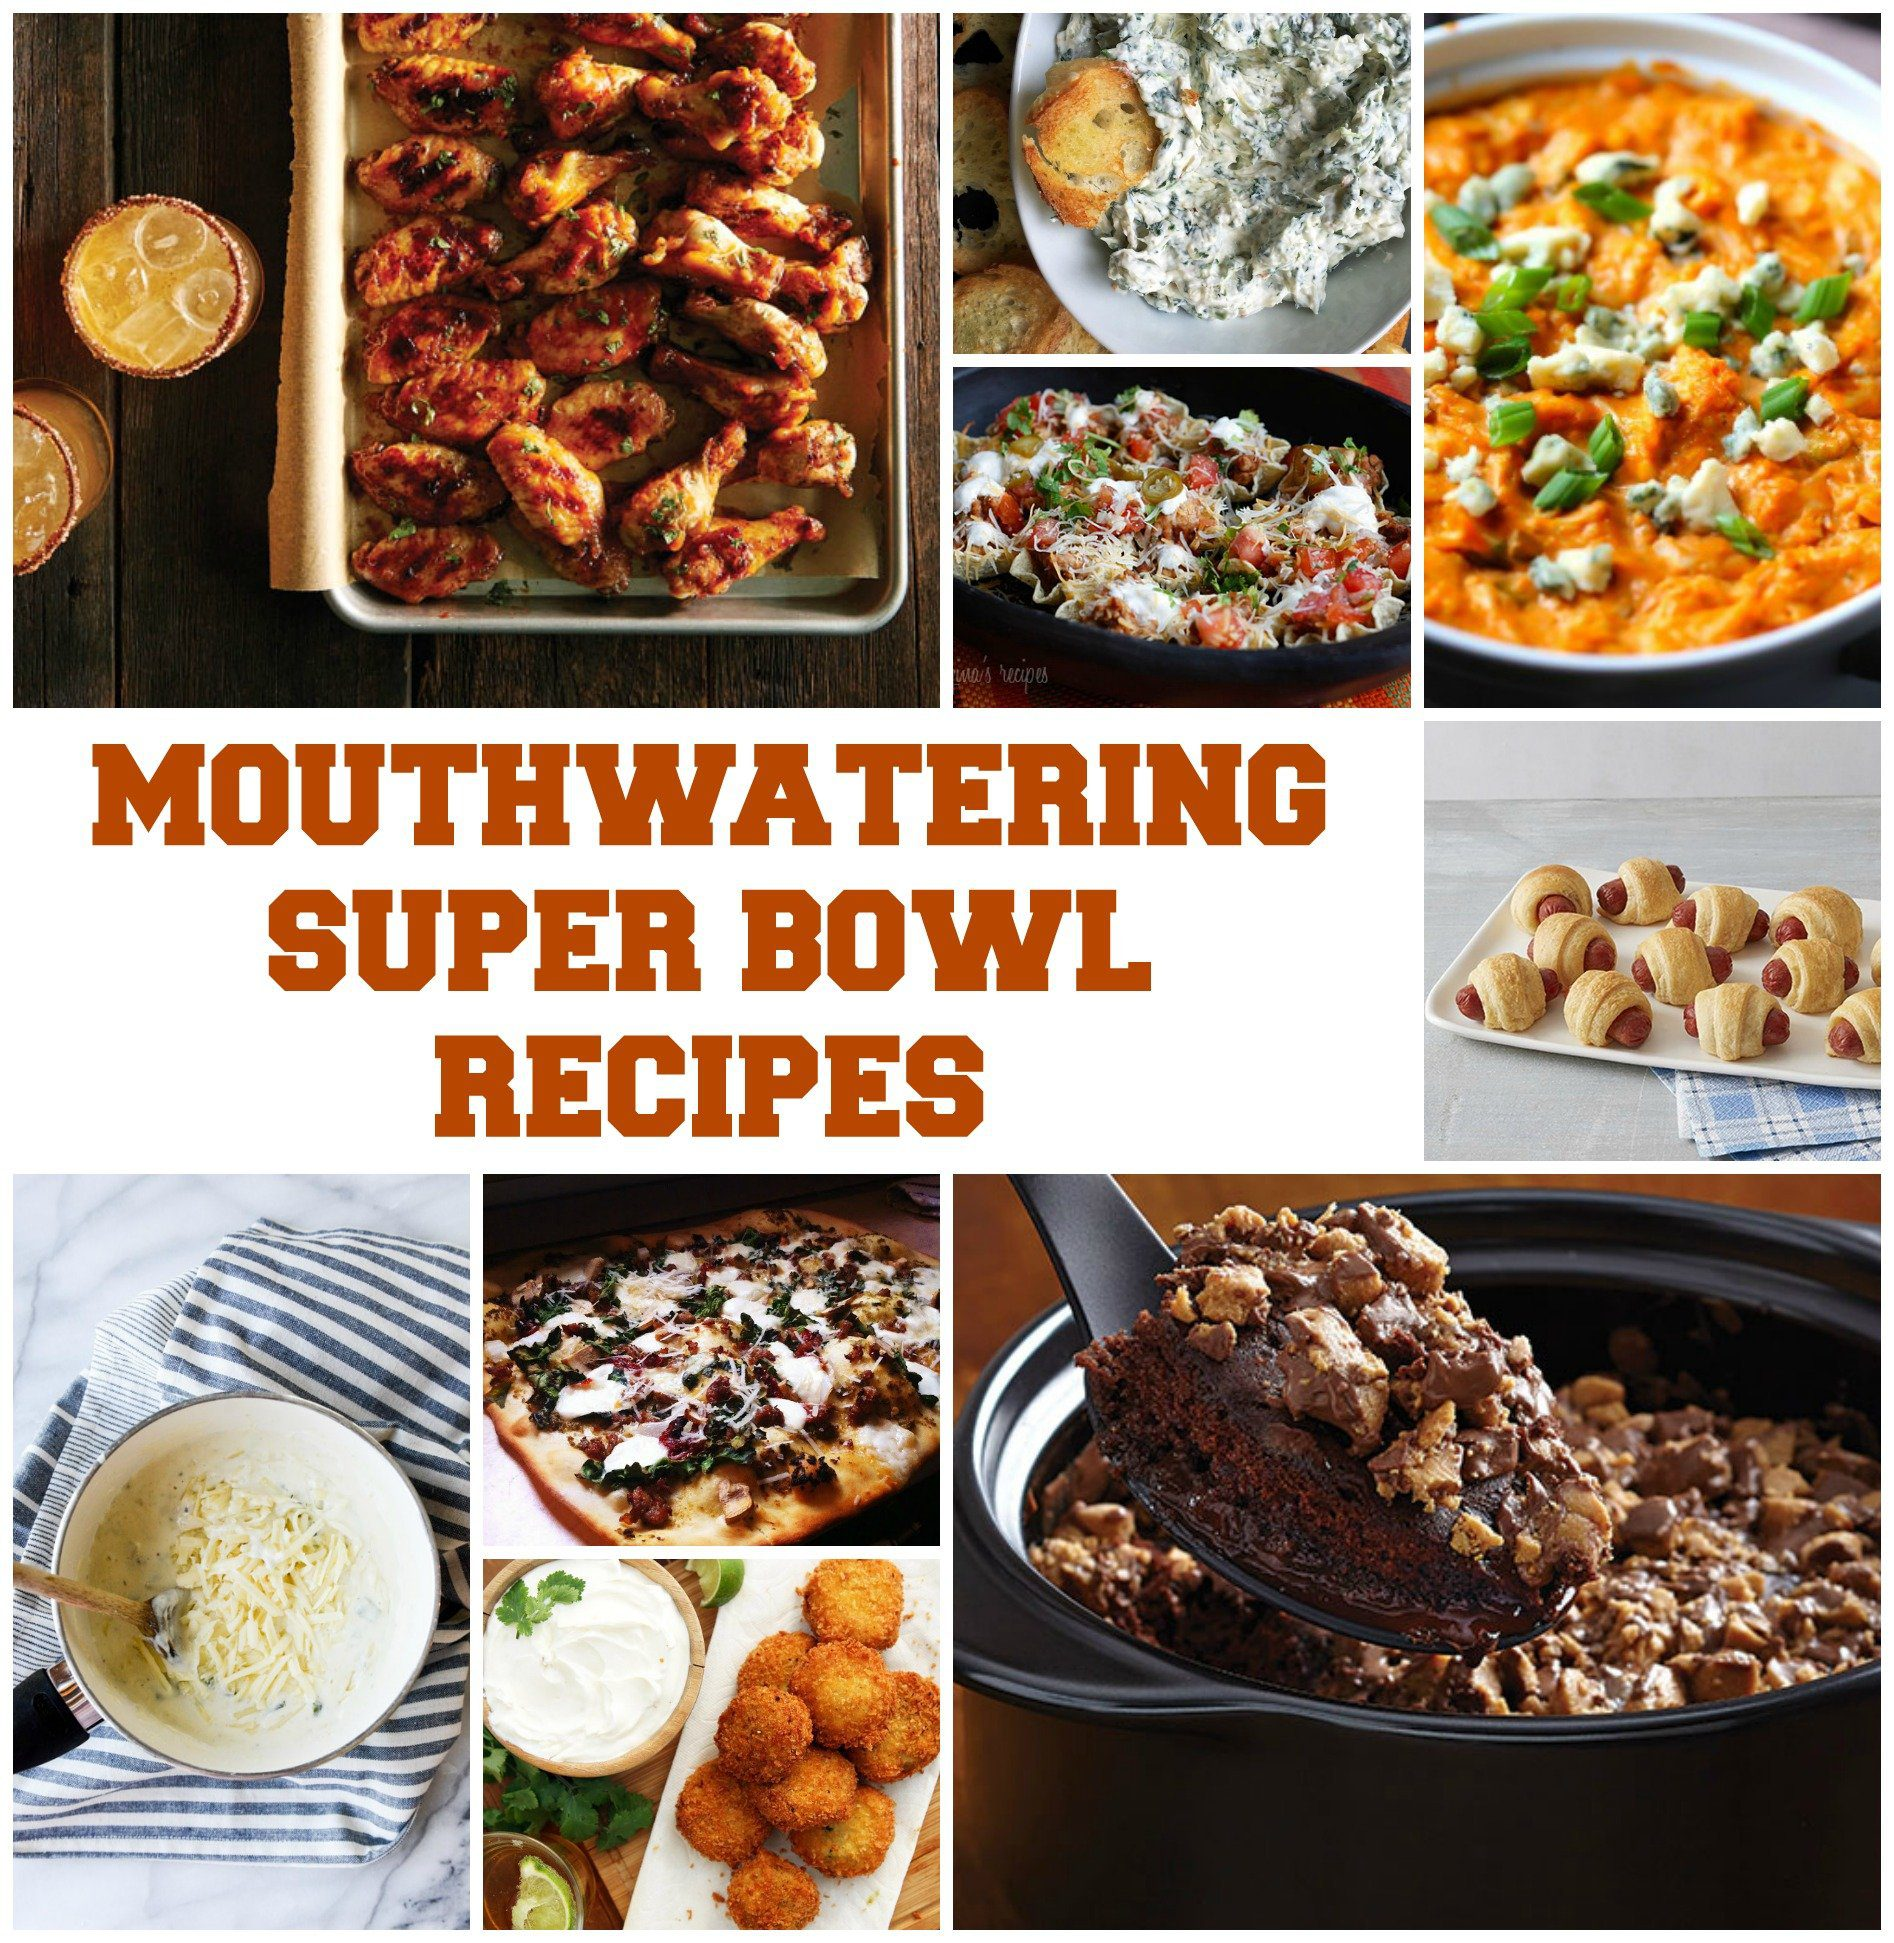 Super Bowl Recipes You NEED To Make